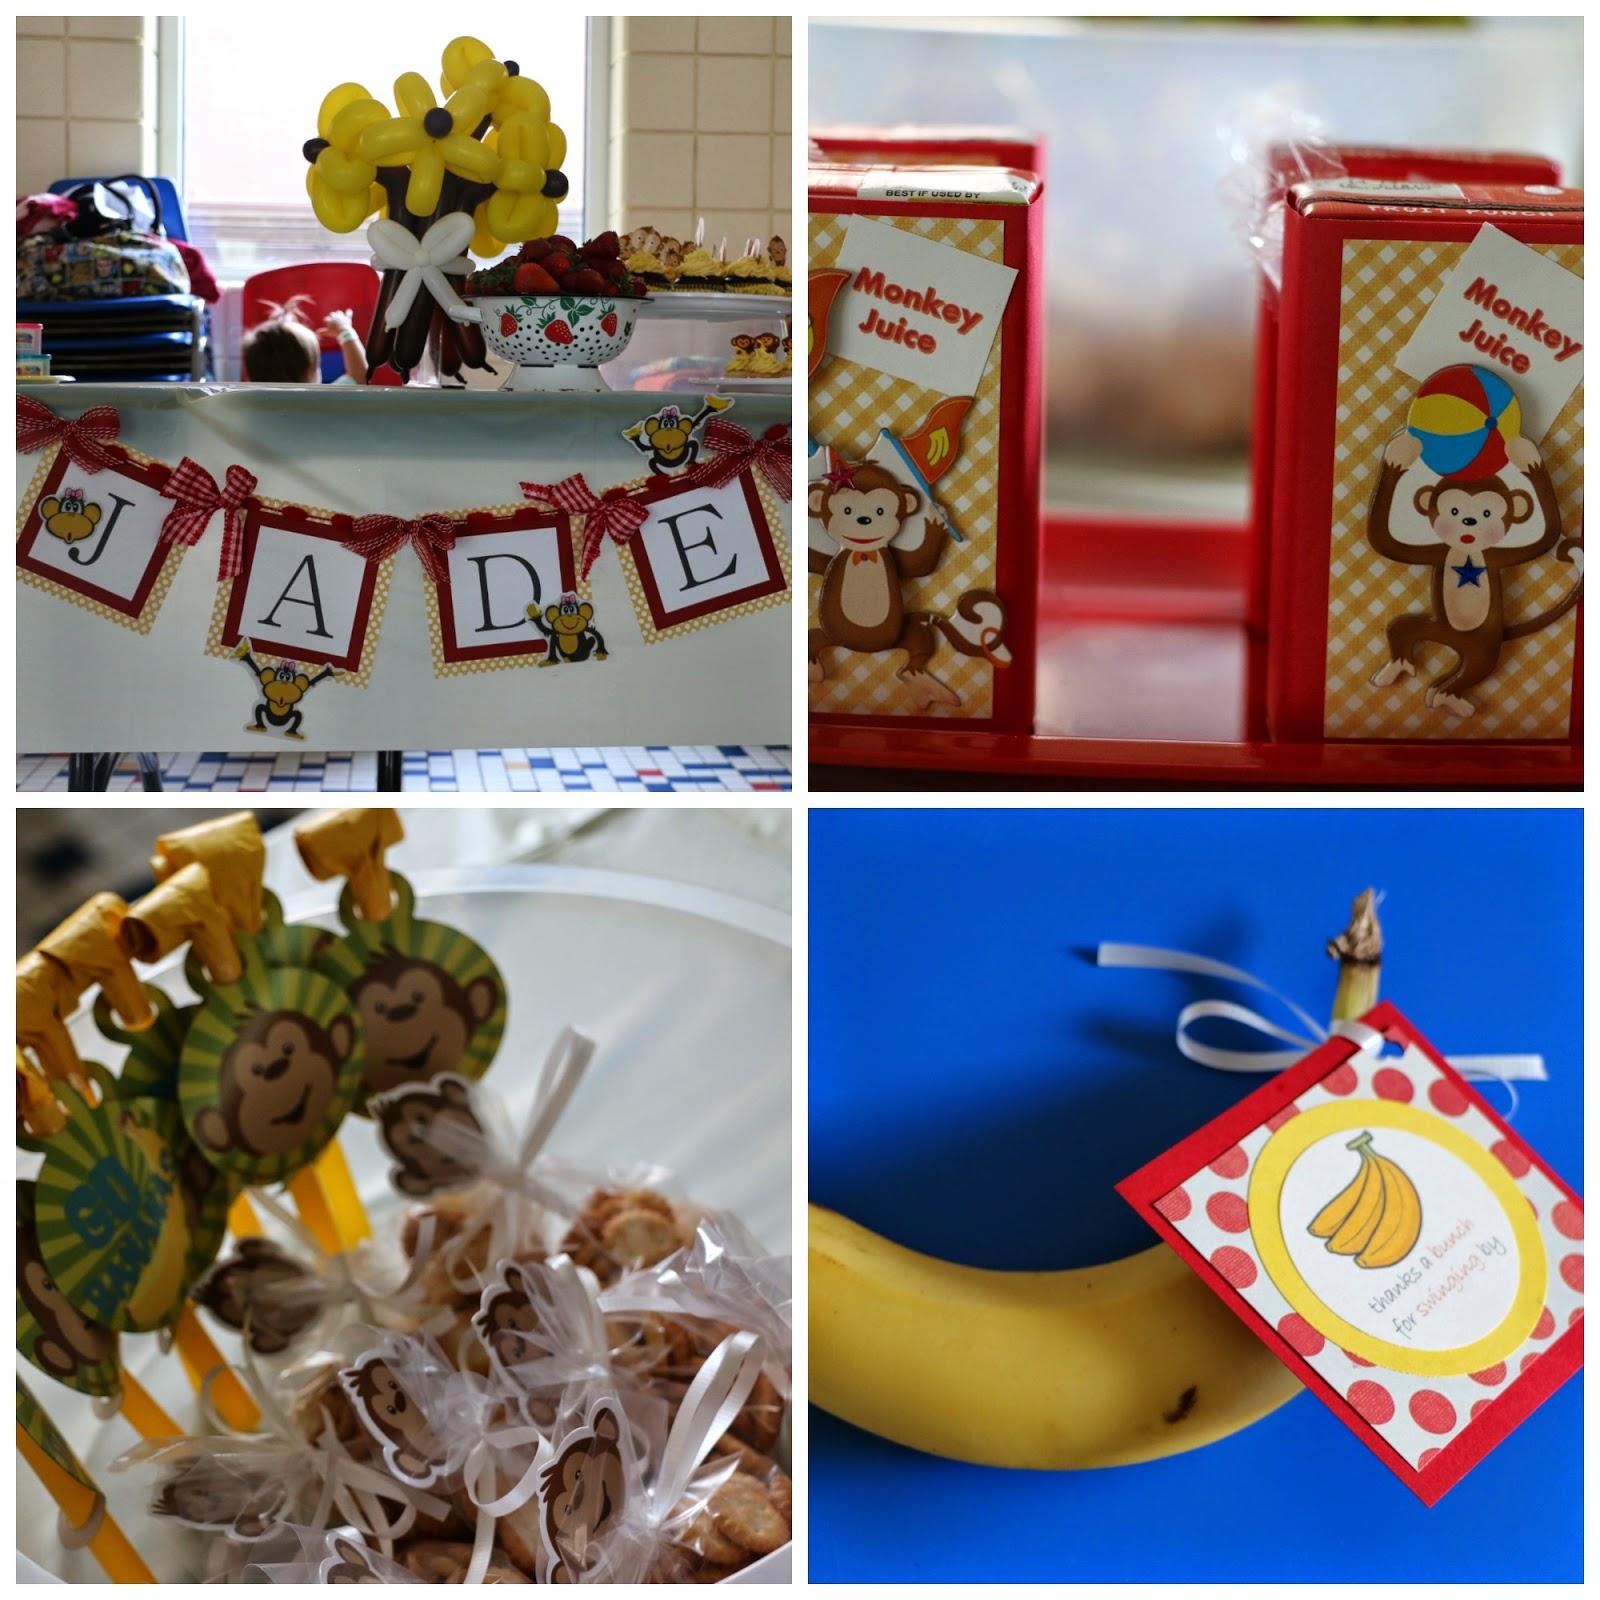 http://flipoutfam.blogspot.com/2014/06/birthday-parties.html